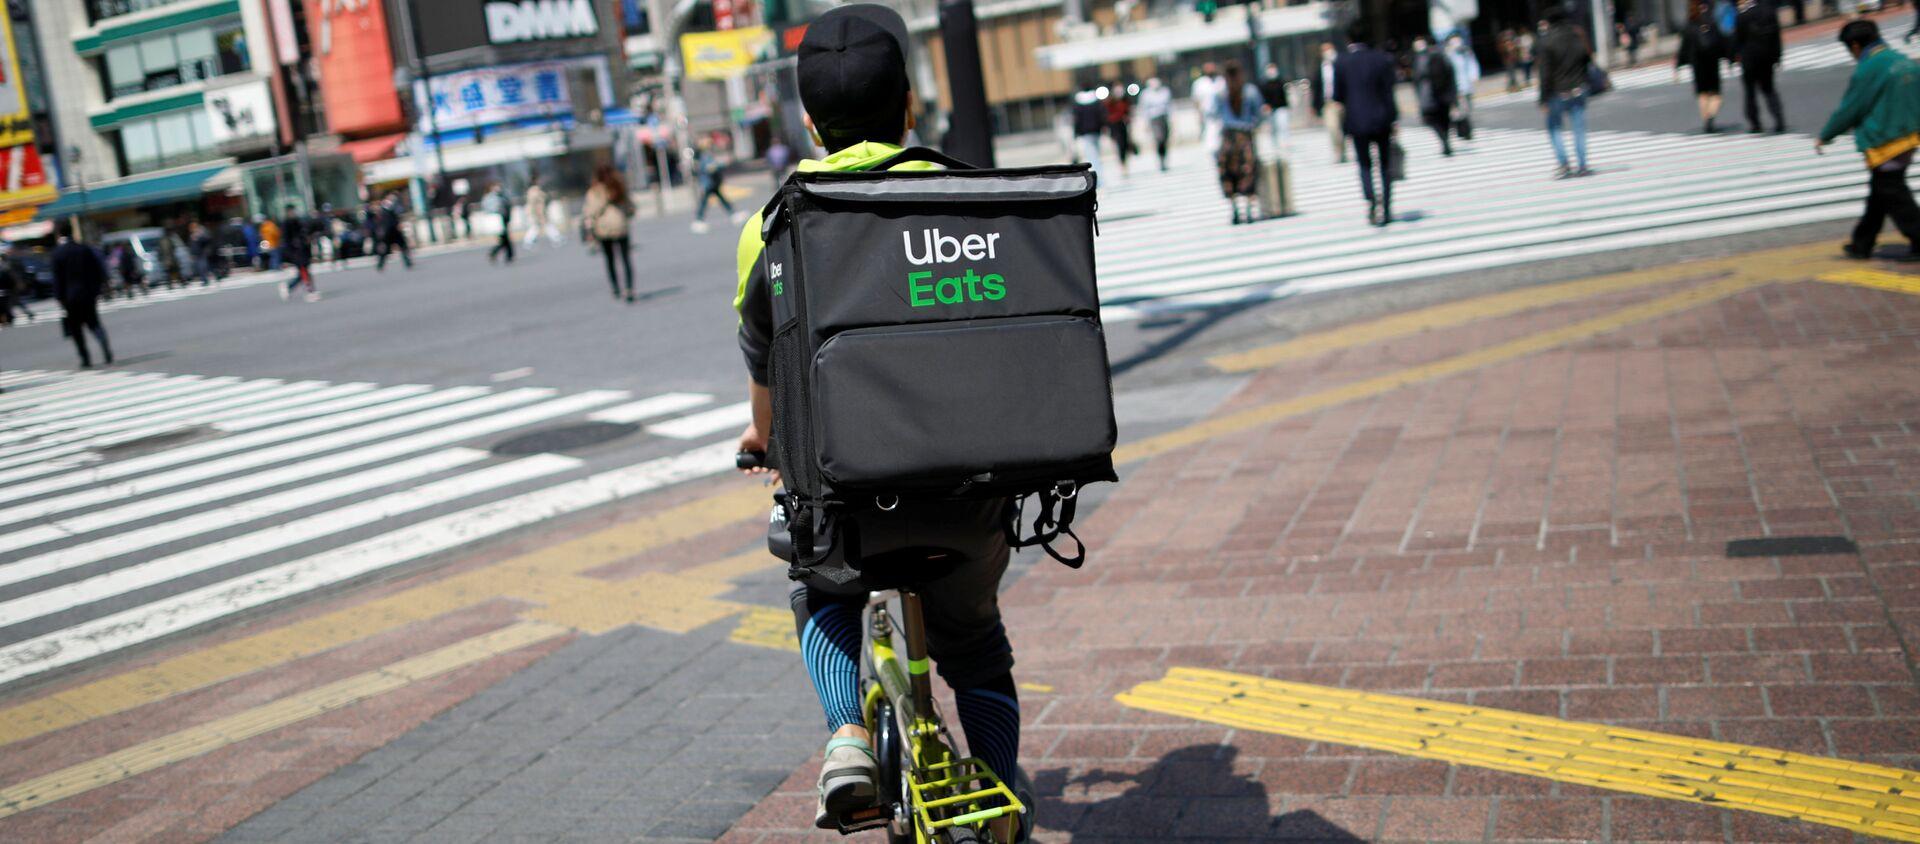 Uber Eats en Japón - Sputnik Mundo, 1920, 09.04.2020